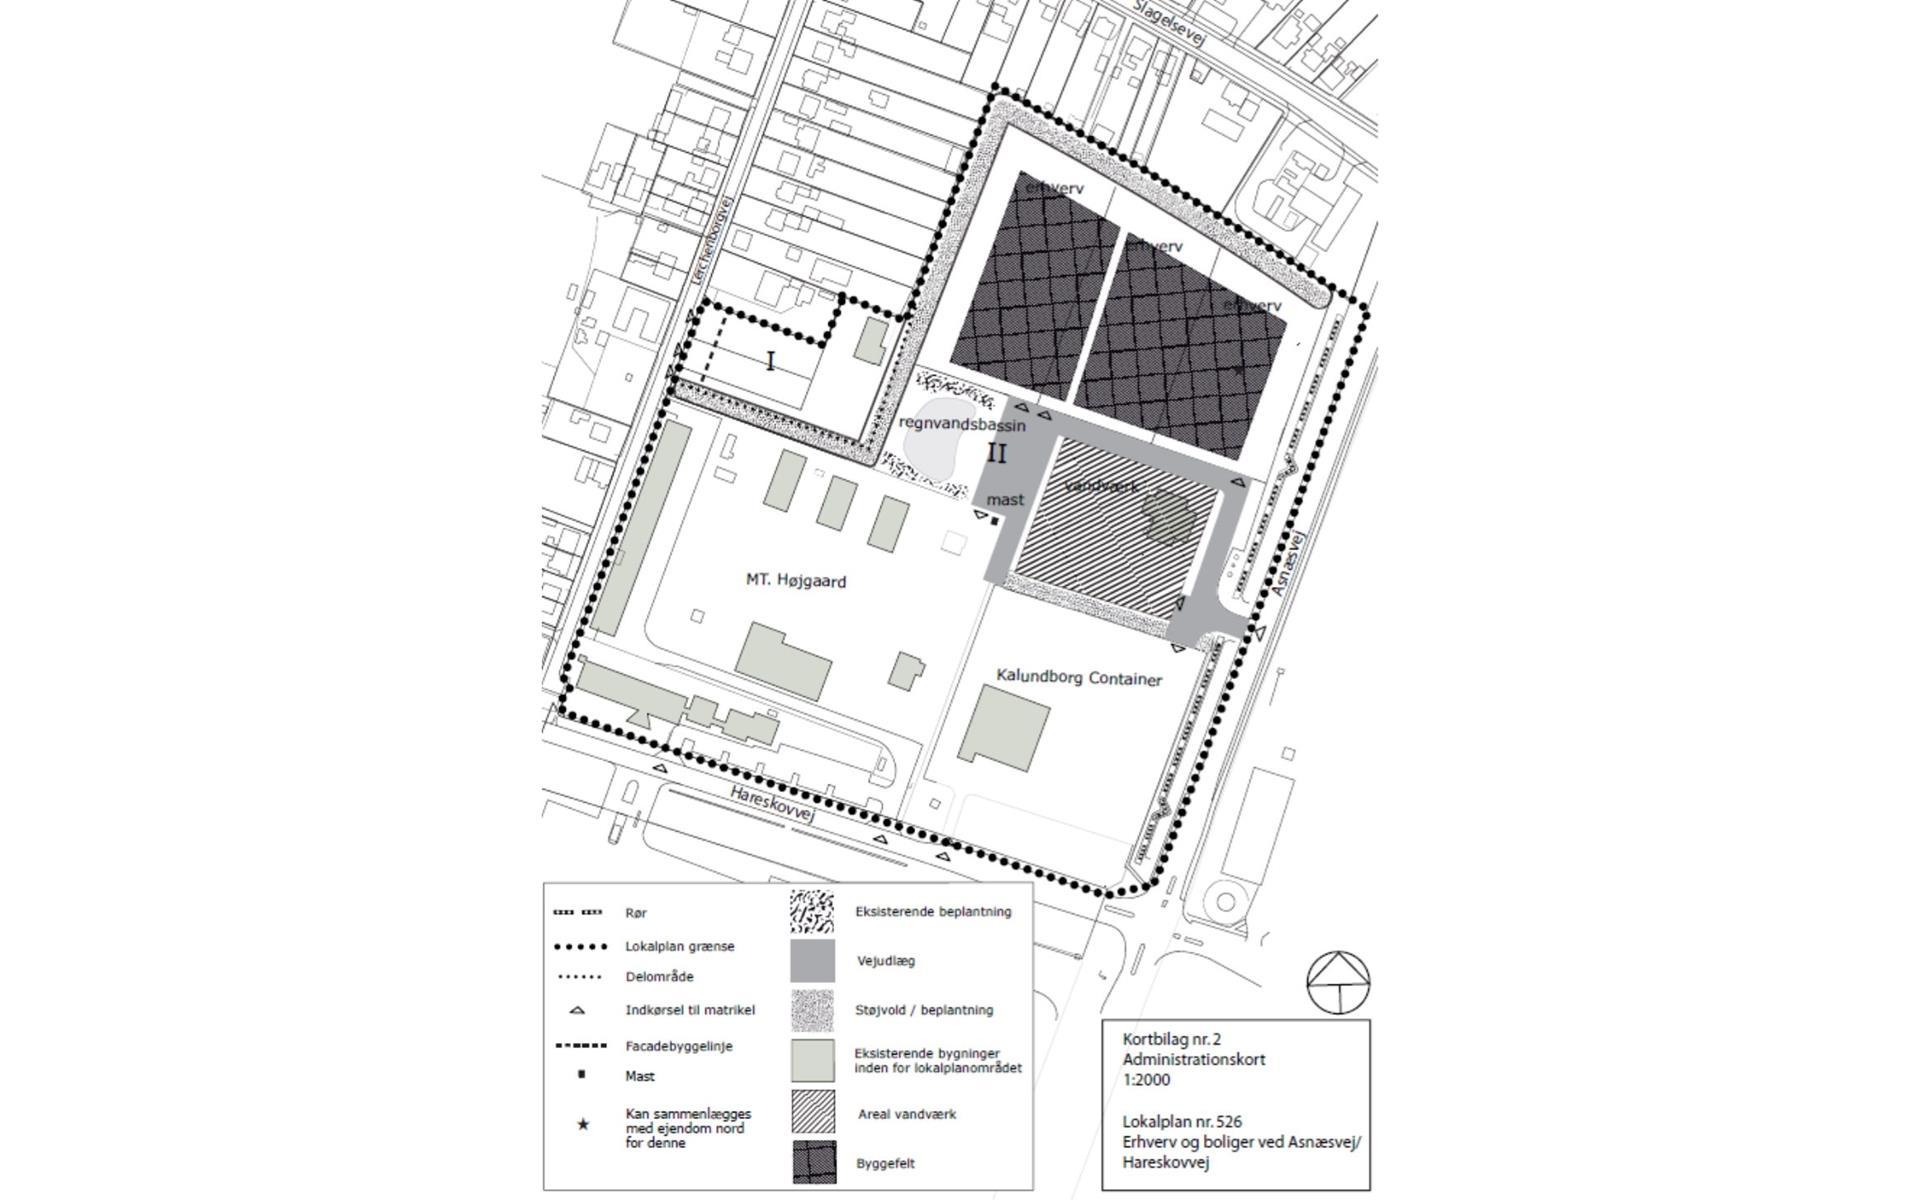 Erhvervsgrund på Asnæsvej i Kalundborg - Plantegning